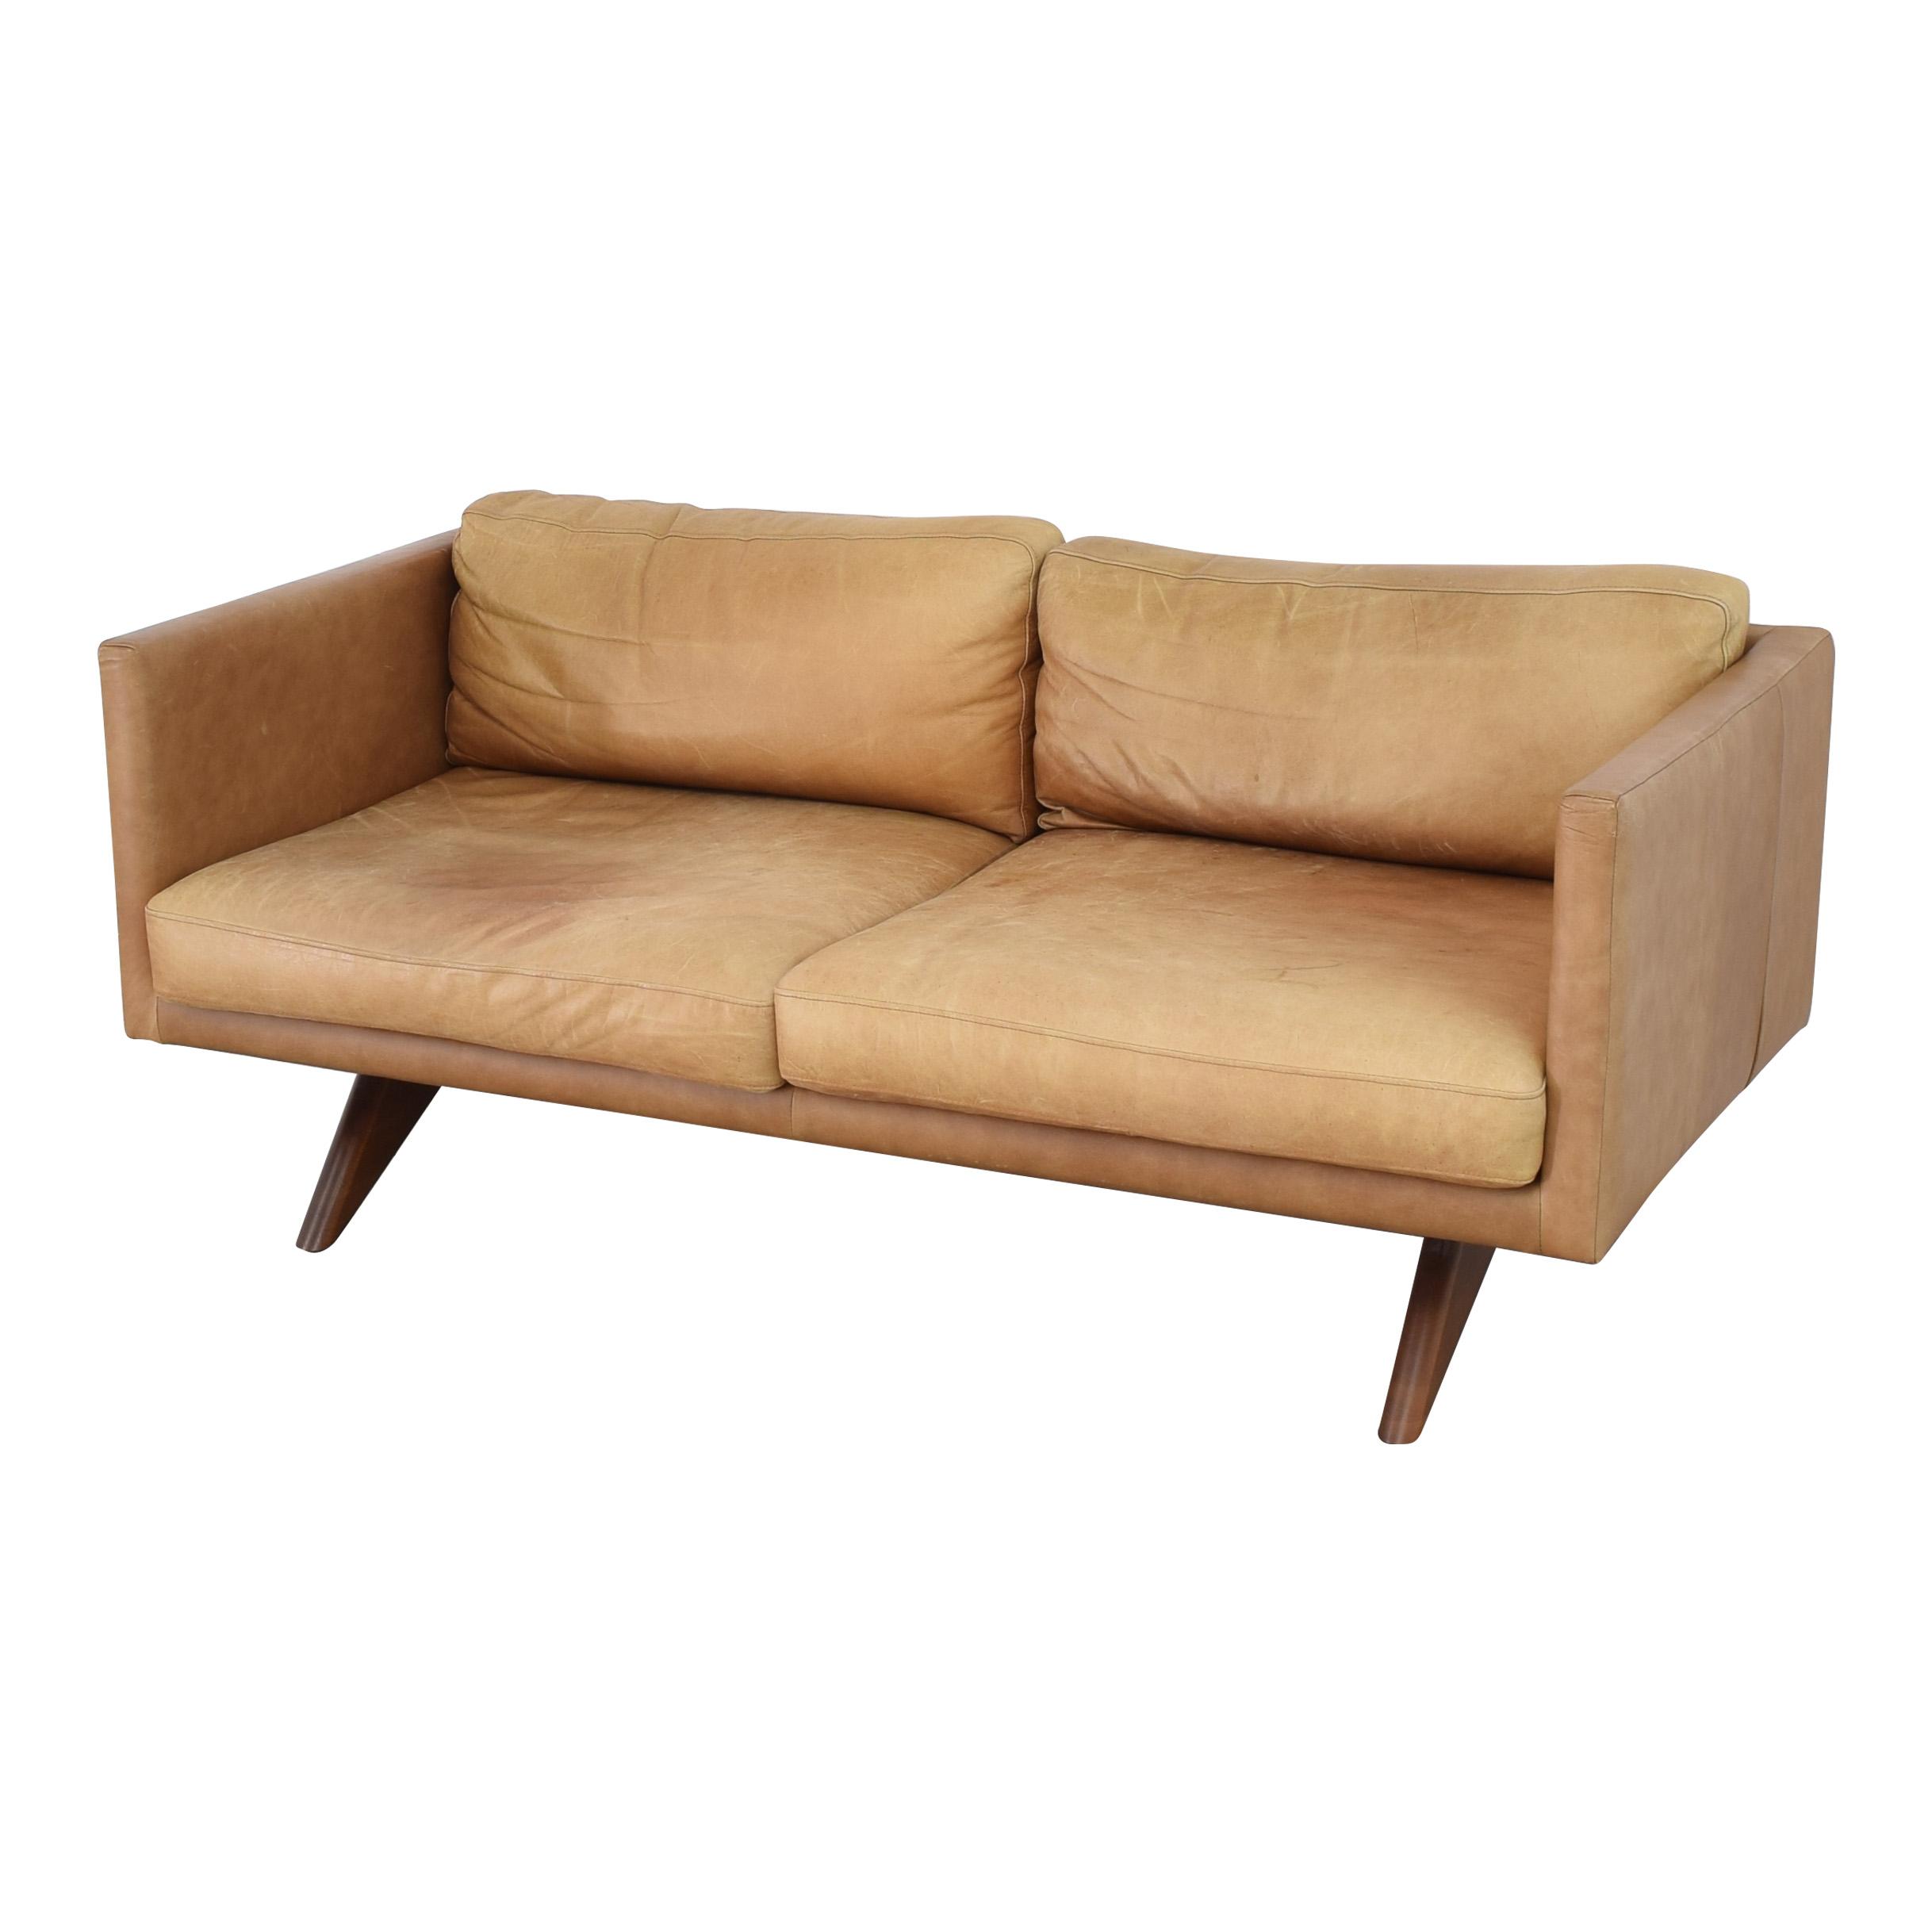 West Elm West Elm Brooklyn Sofa for sale